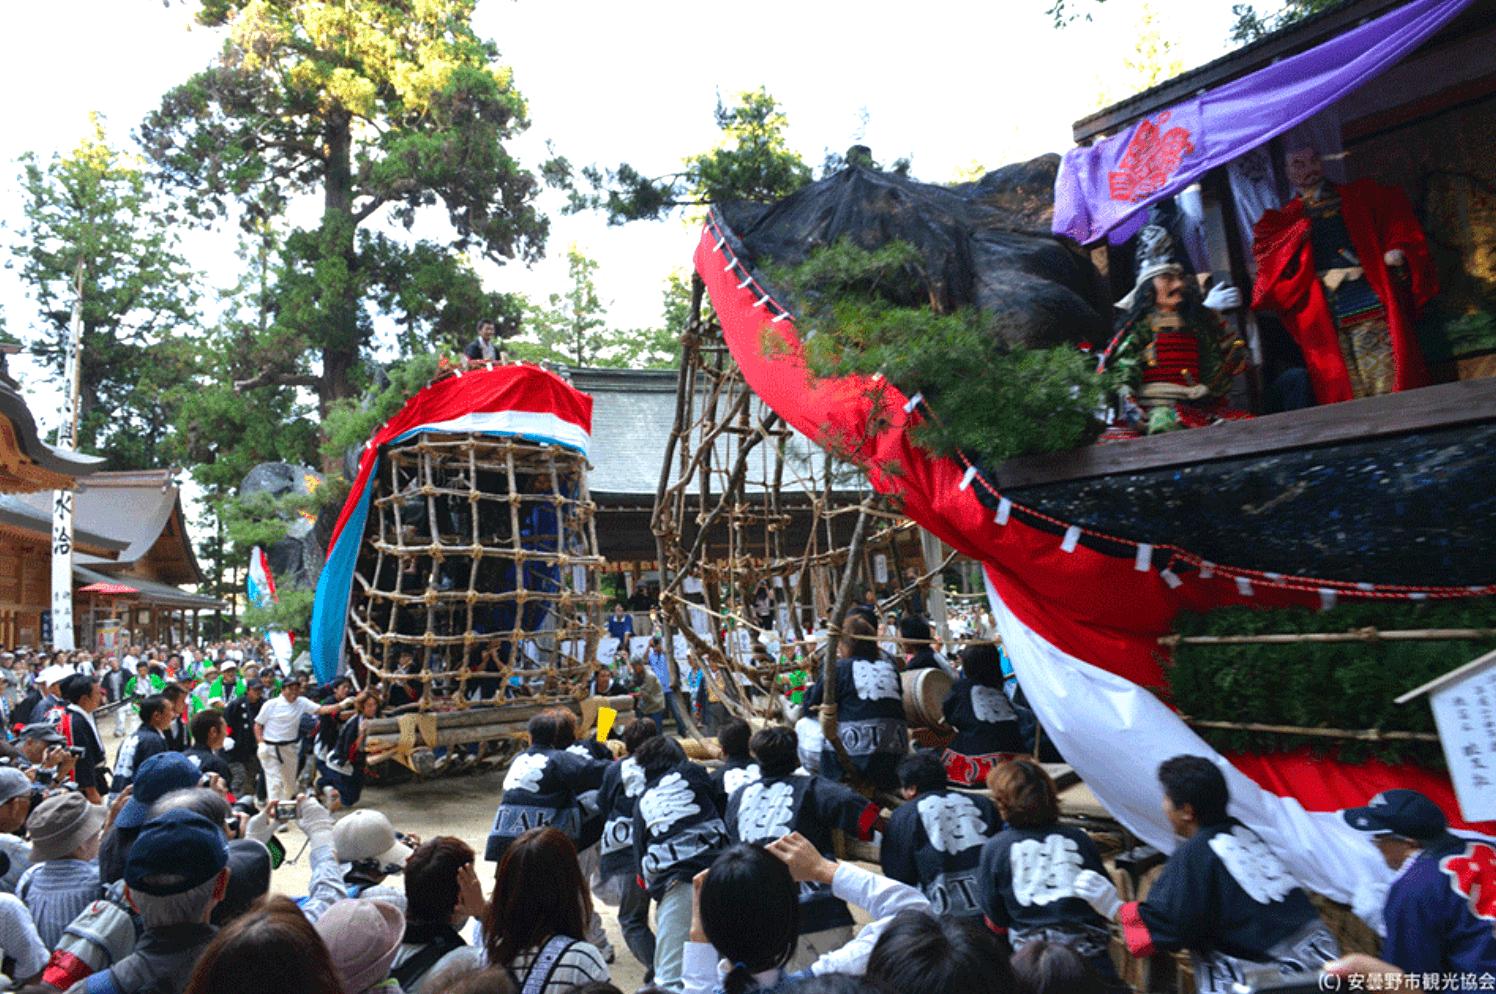 azumino-ofune-matsuri-large-image